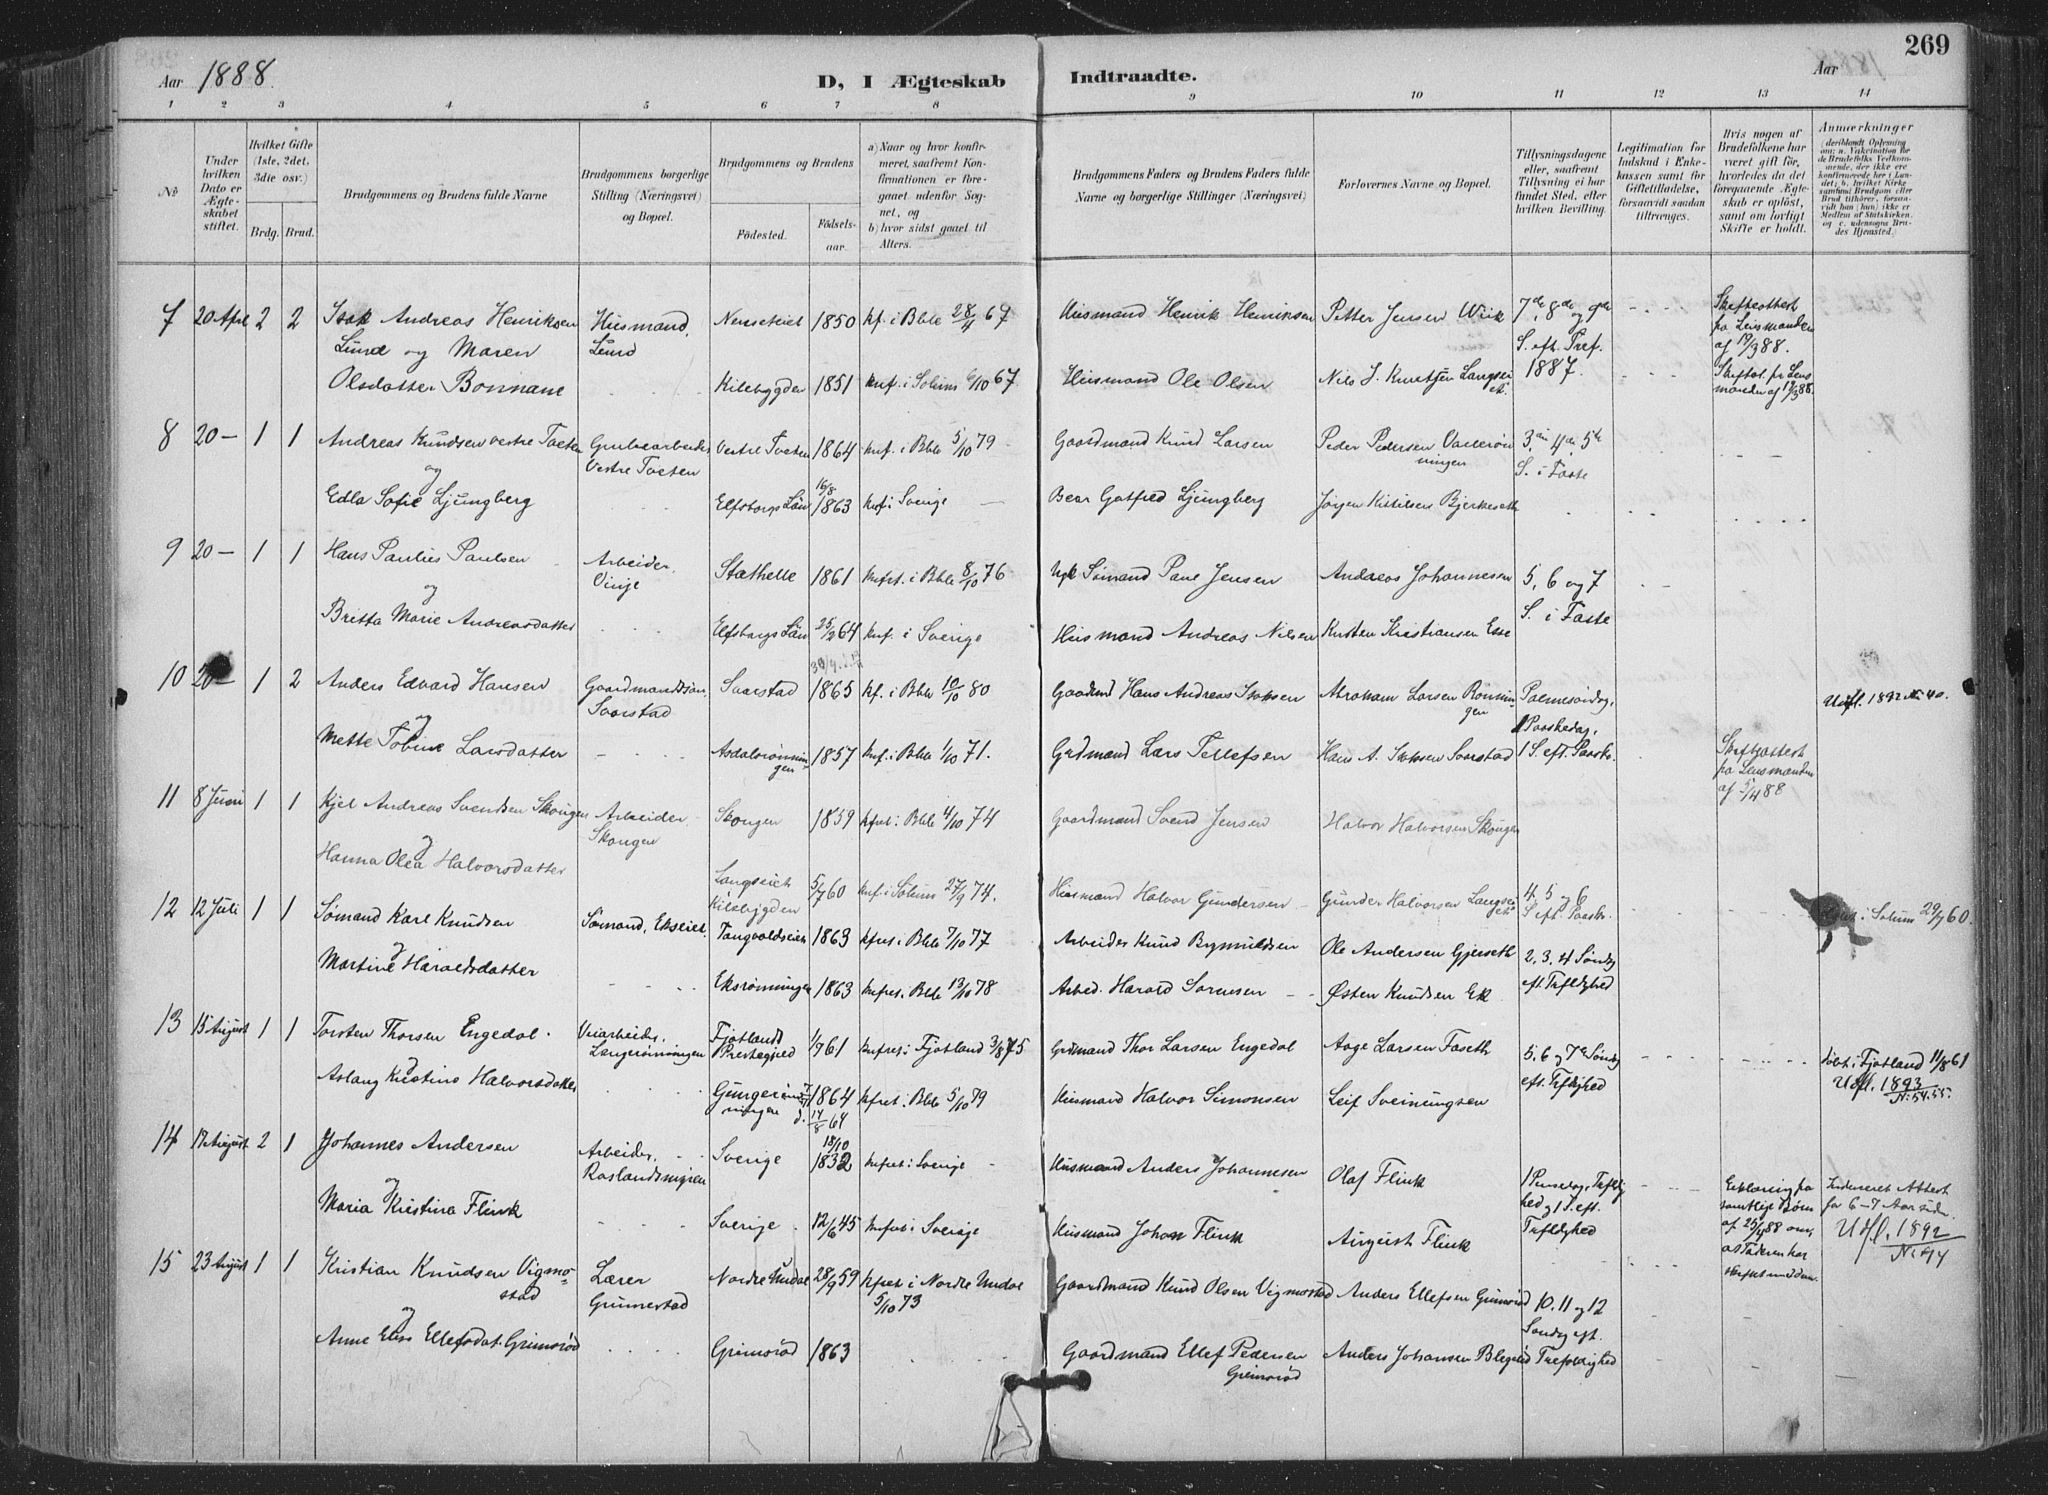 SAKO, Bamble kirkebøker, F/Fa/L0008: Ministerialbok nr. I 8, 1888-1900, s. 269